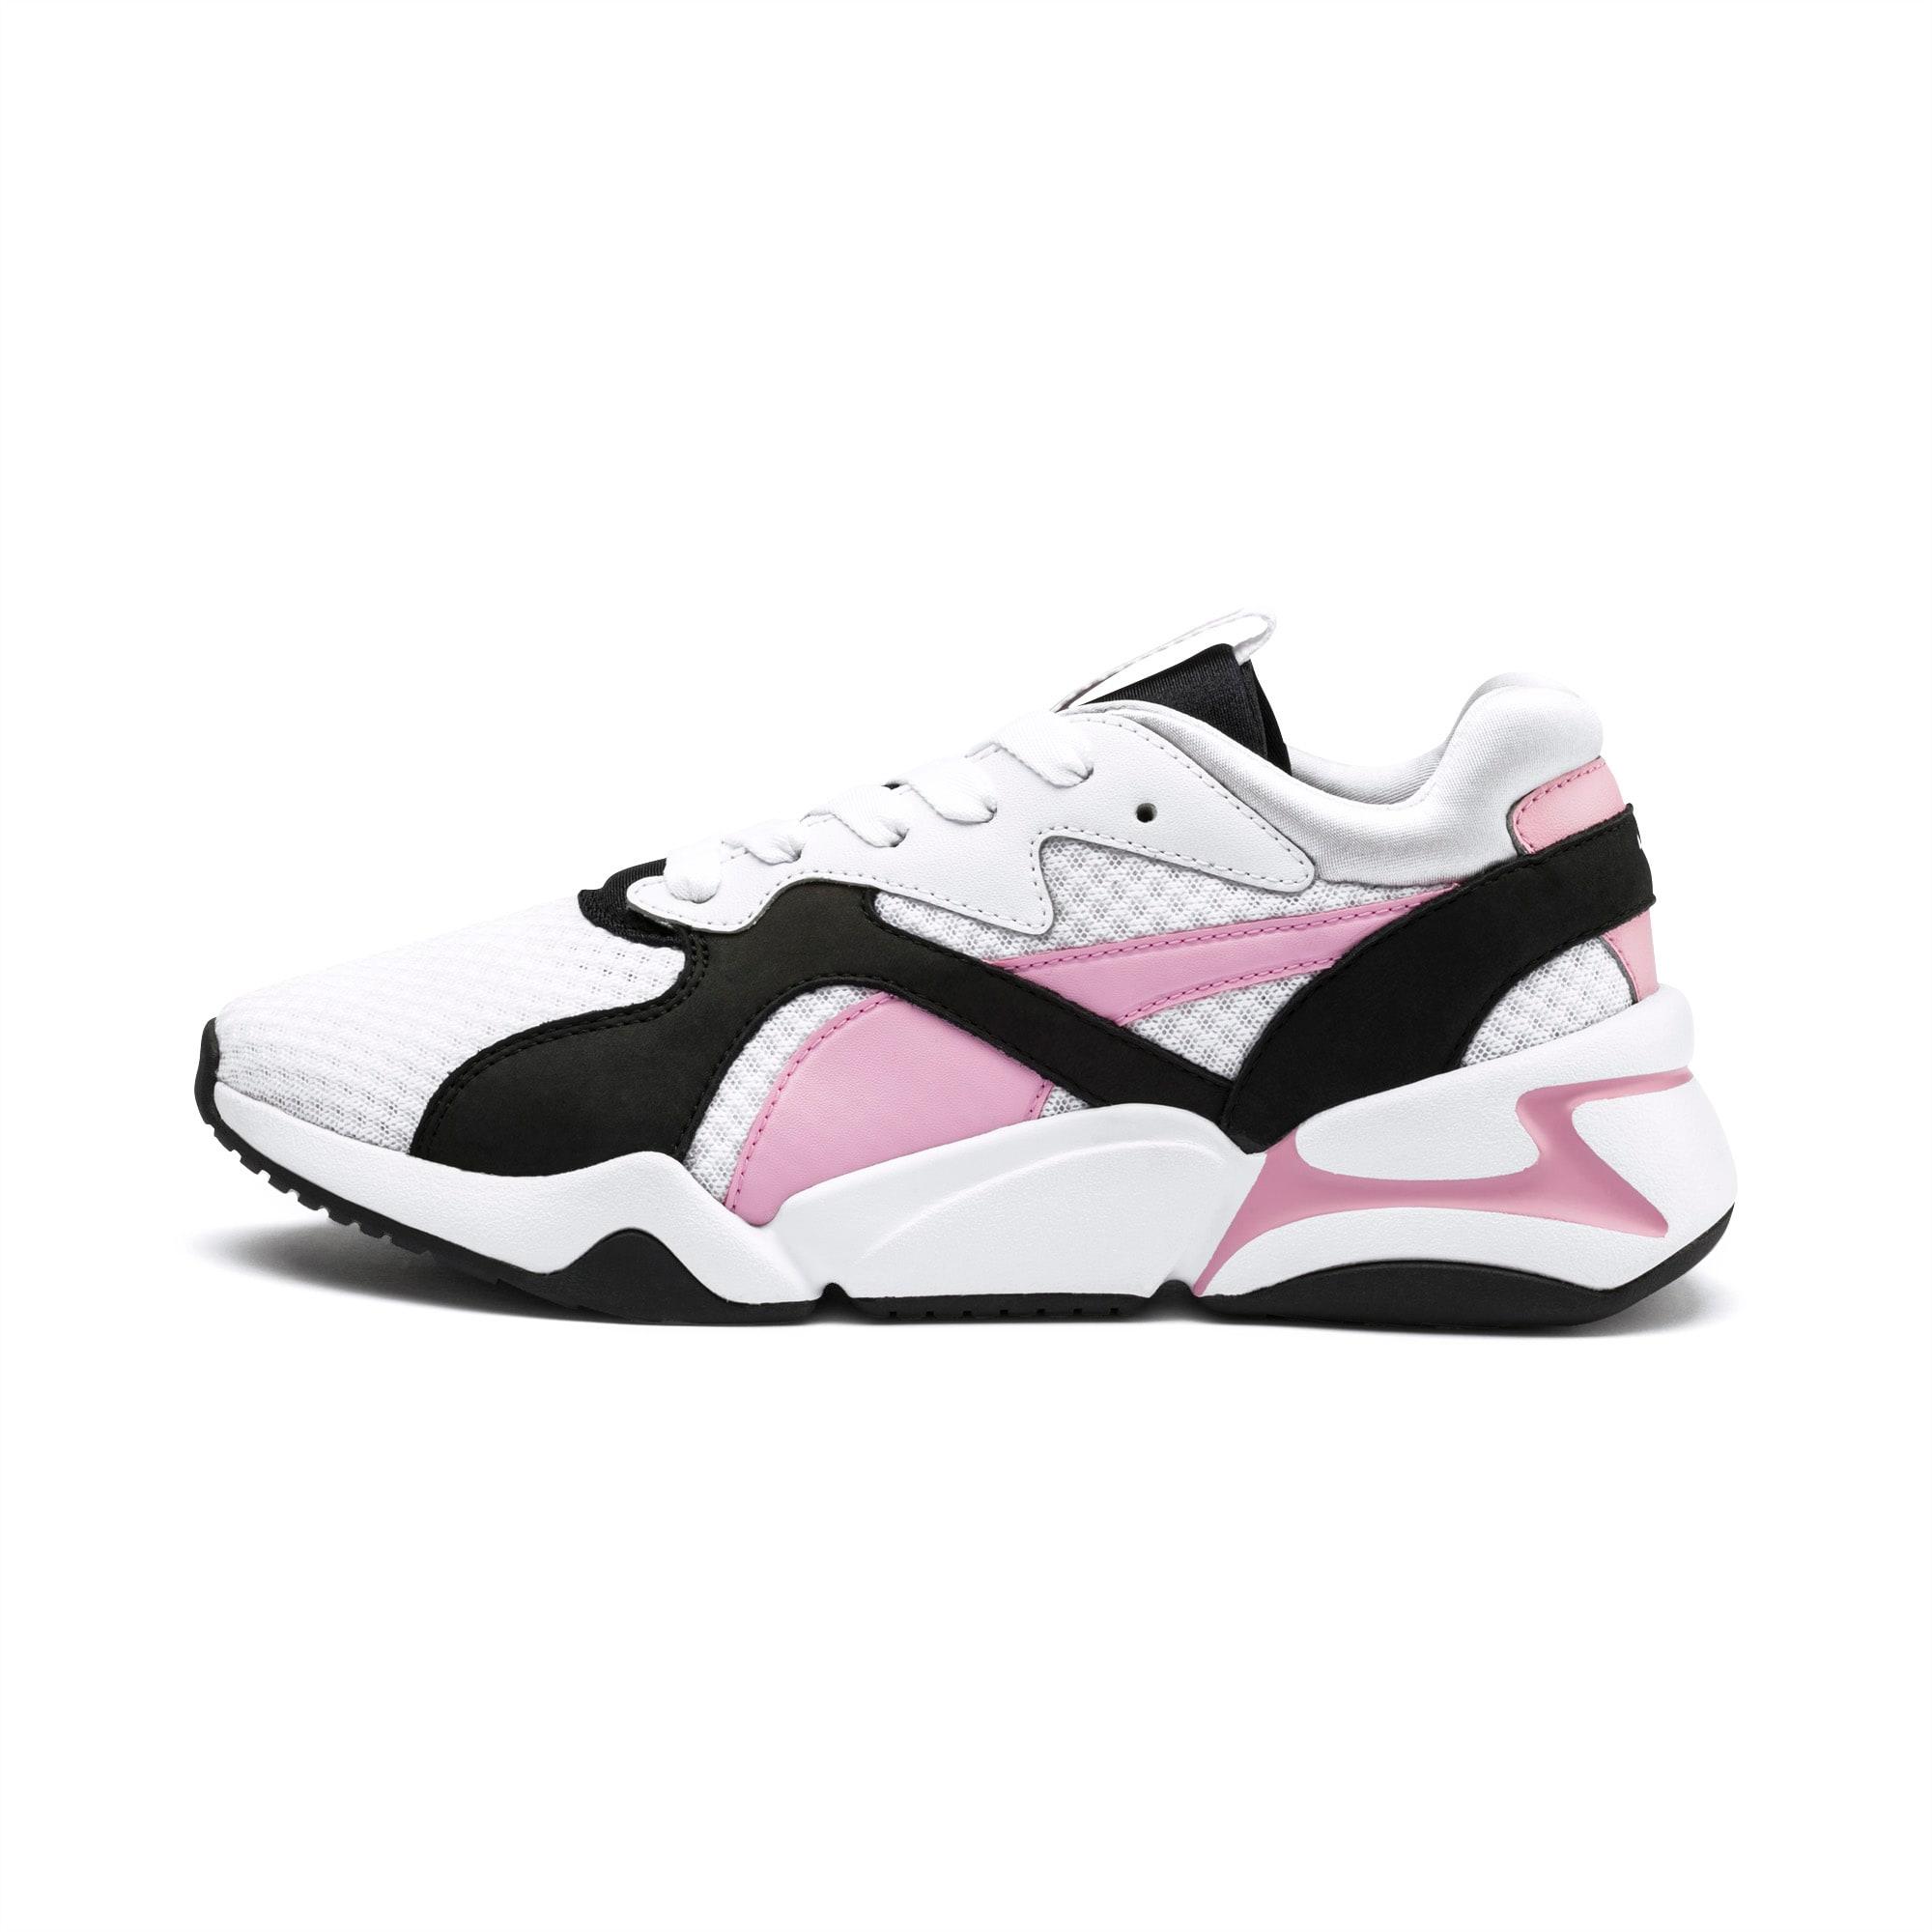 Puma Nova 90'S block white and pink sneakers